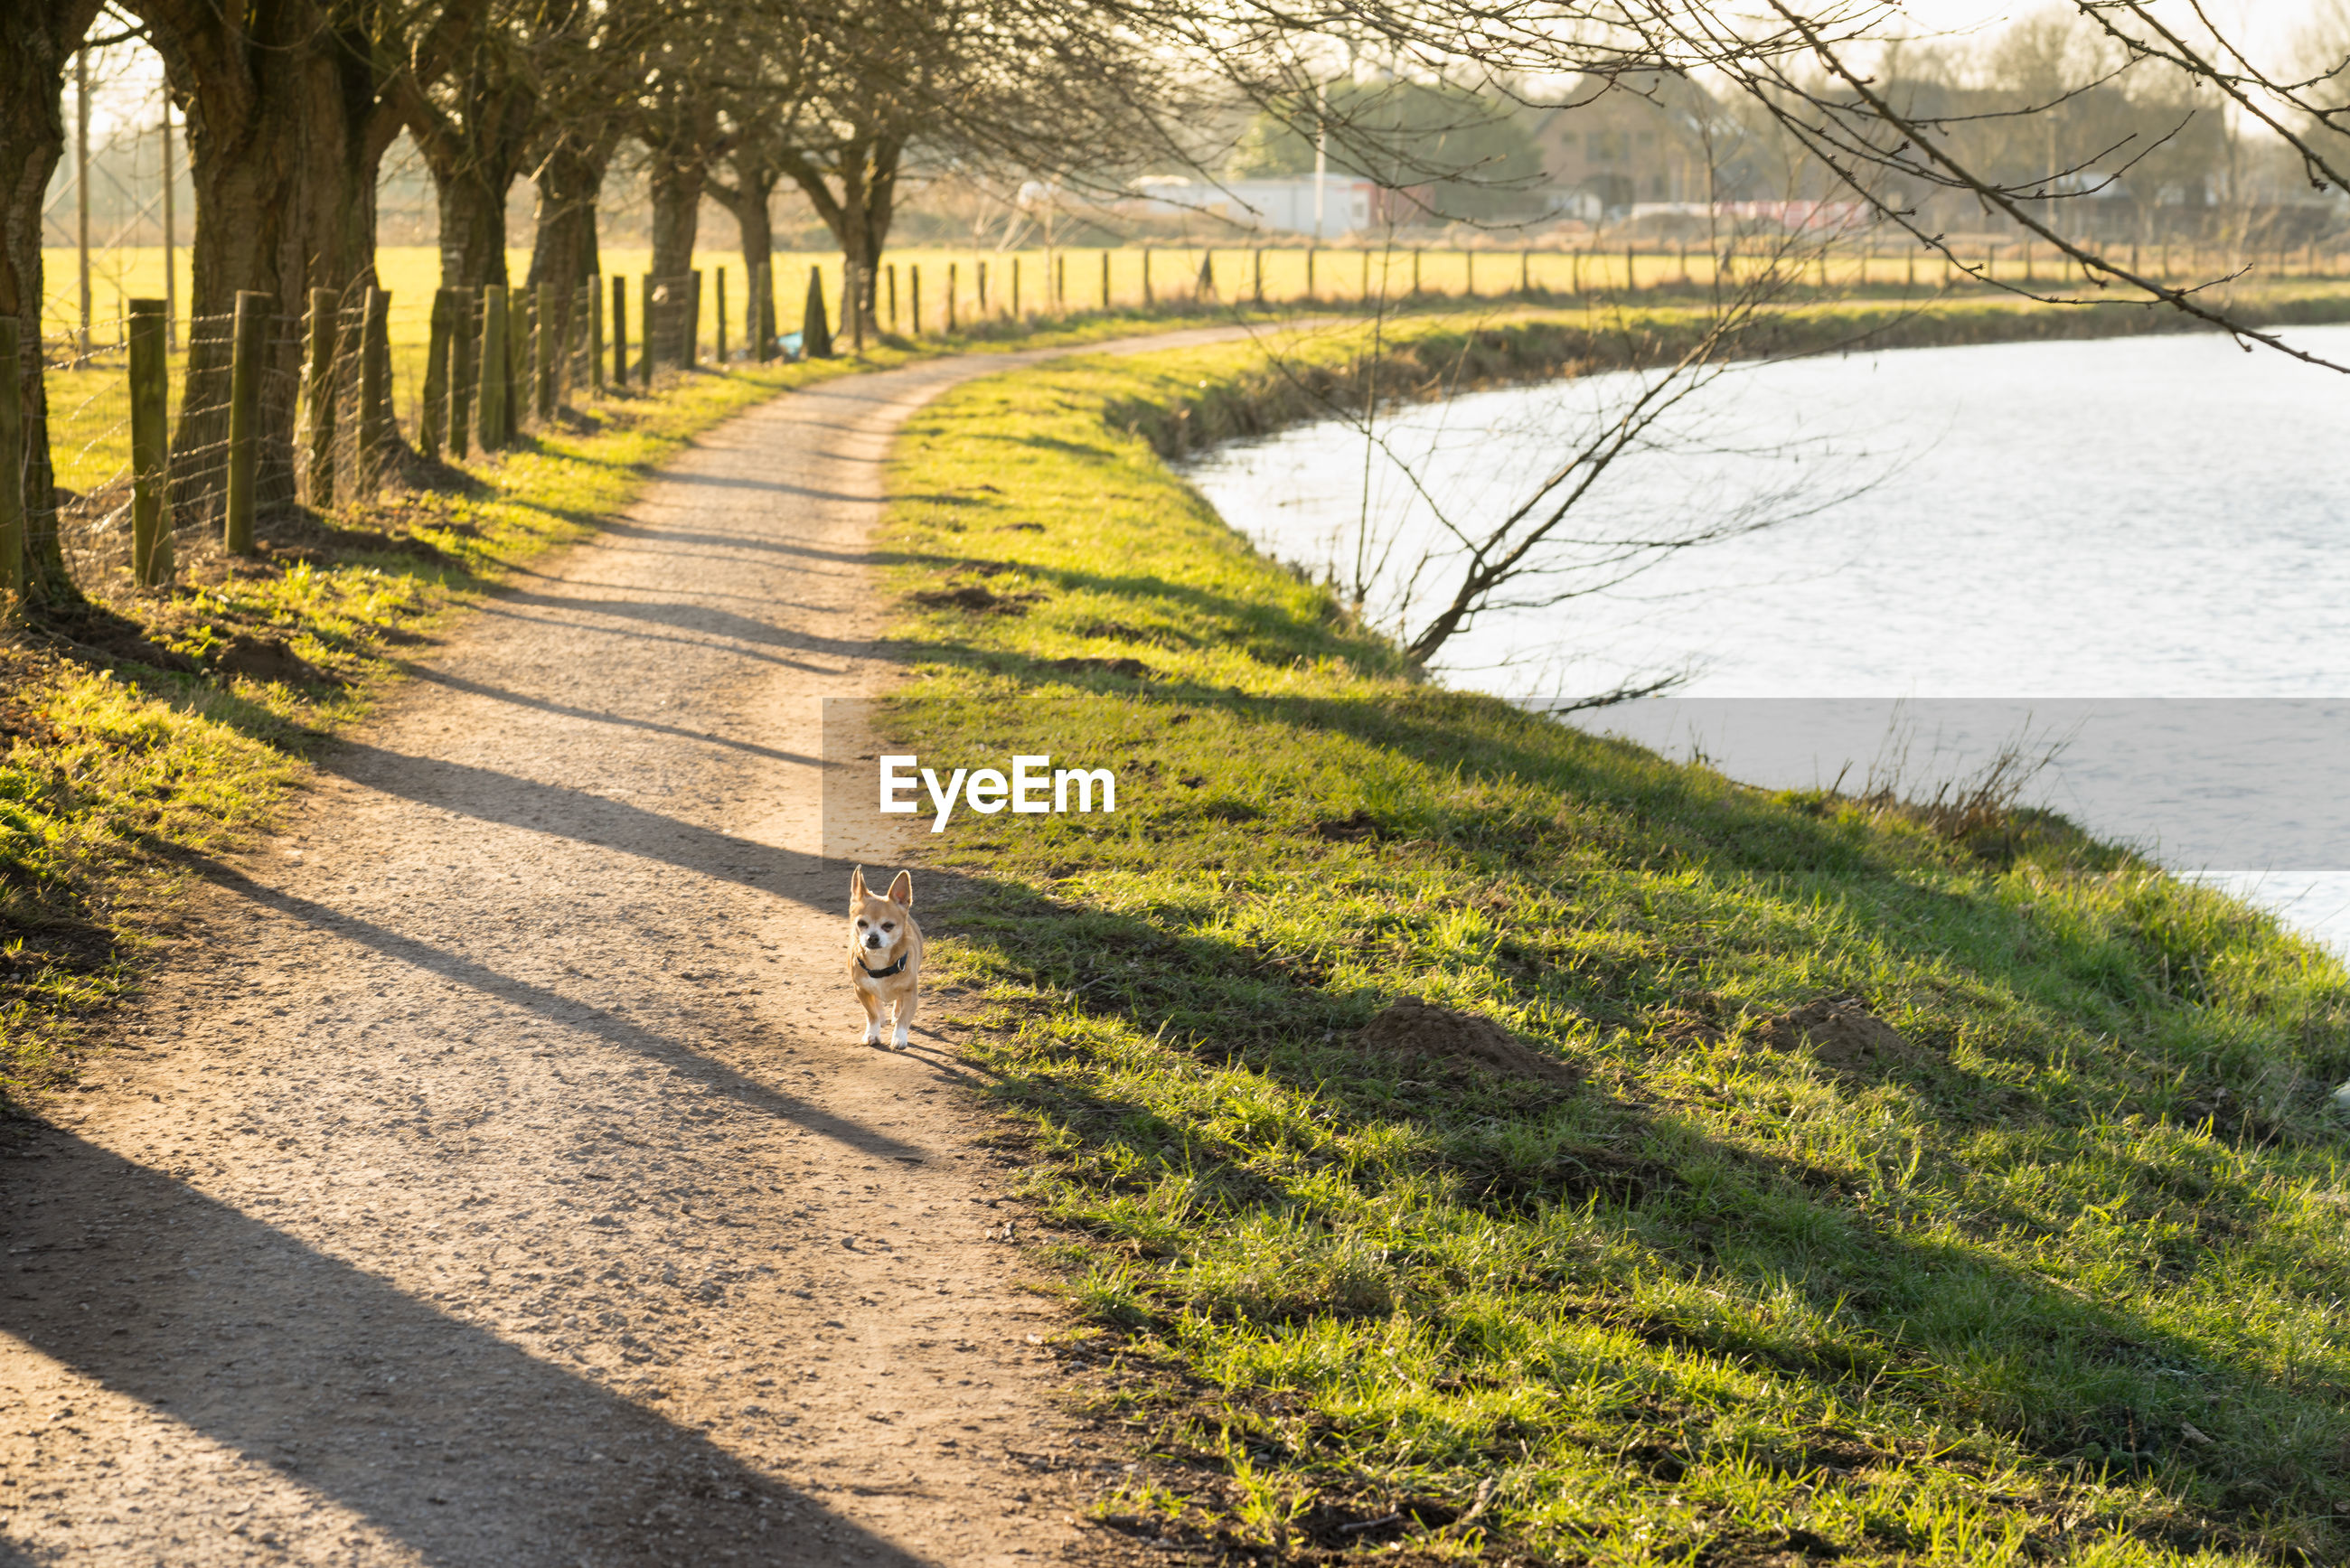 Dog walking on footpath amidst grass by lake